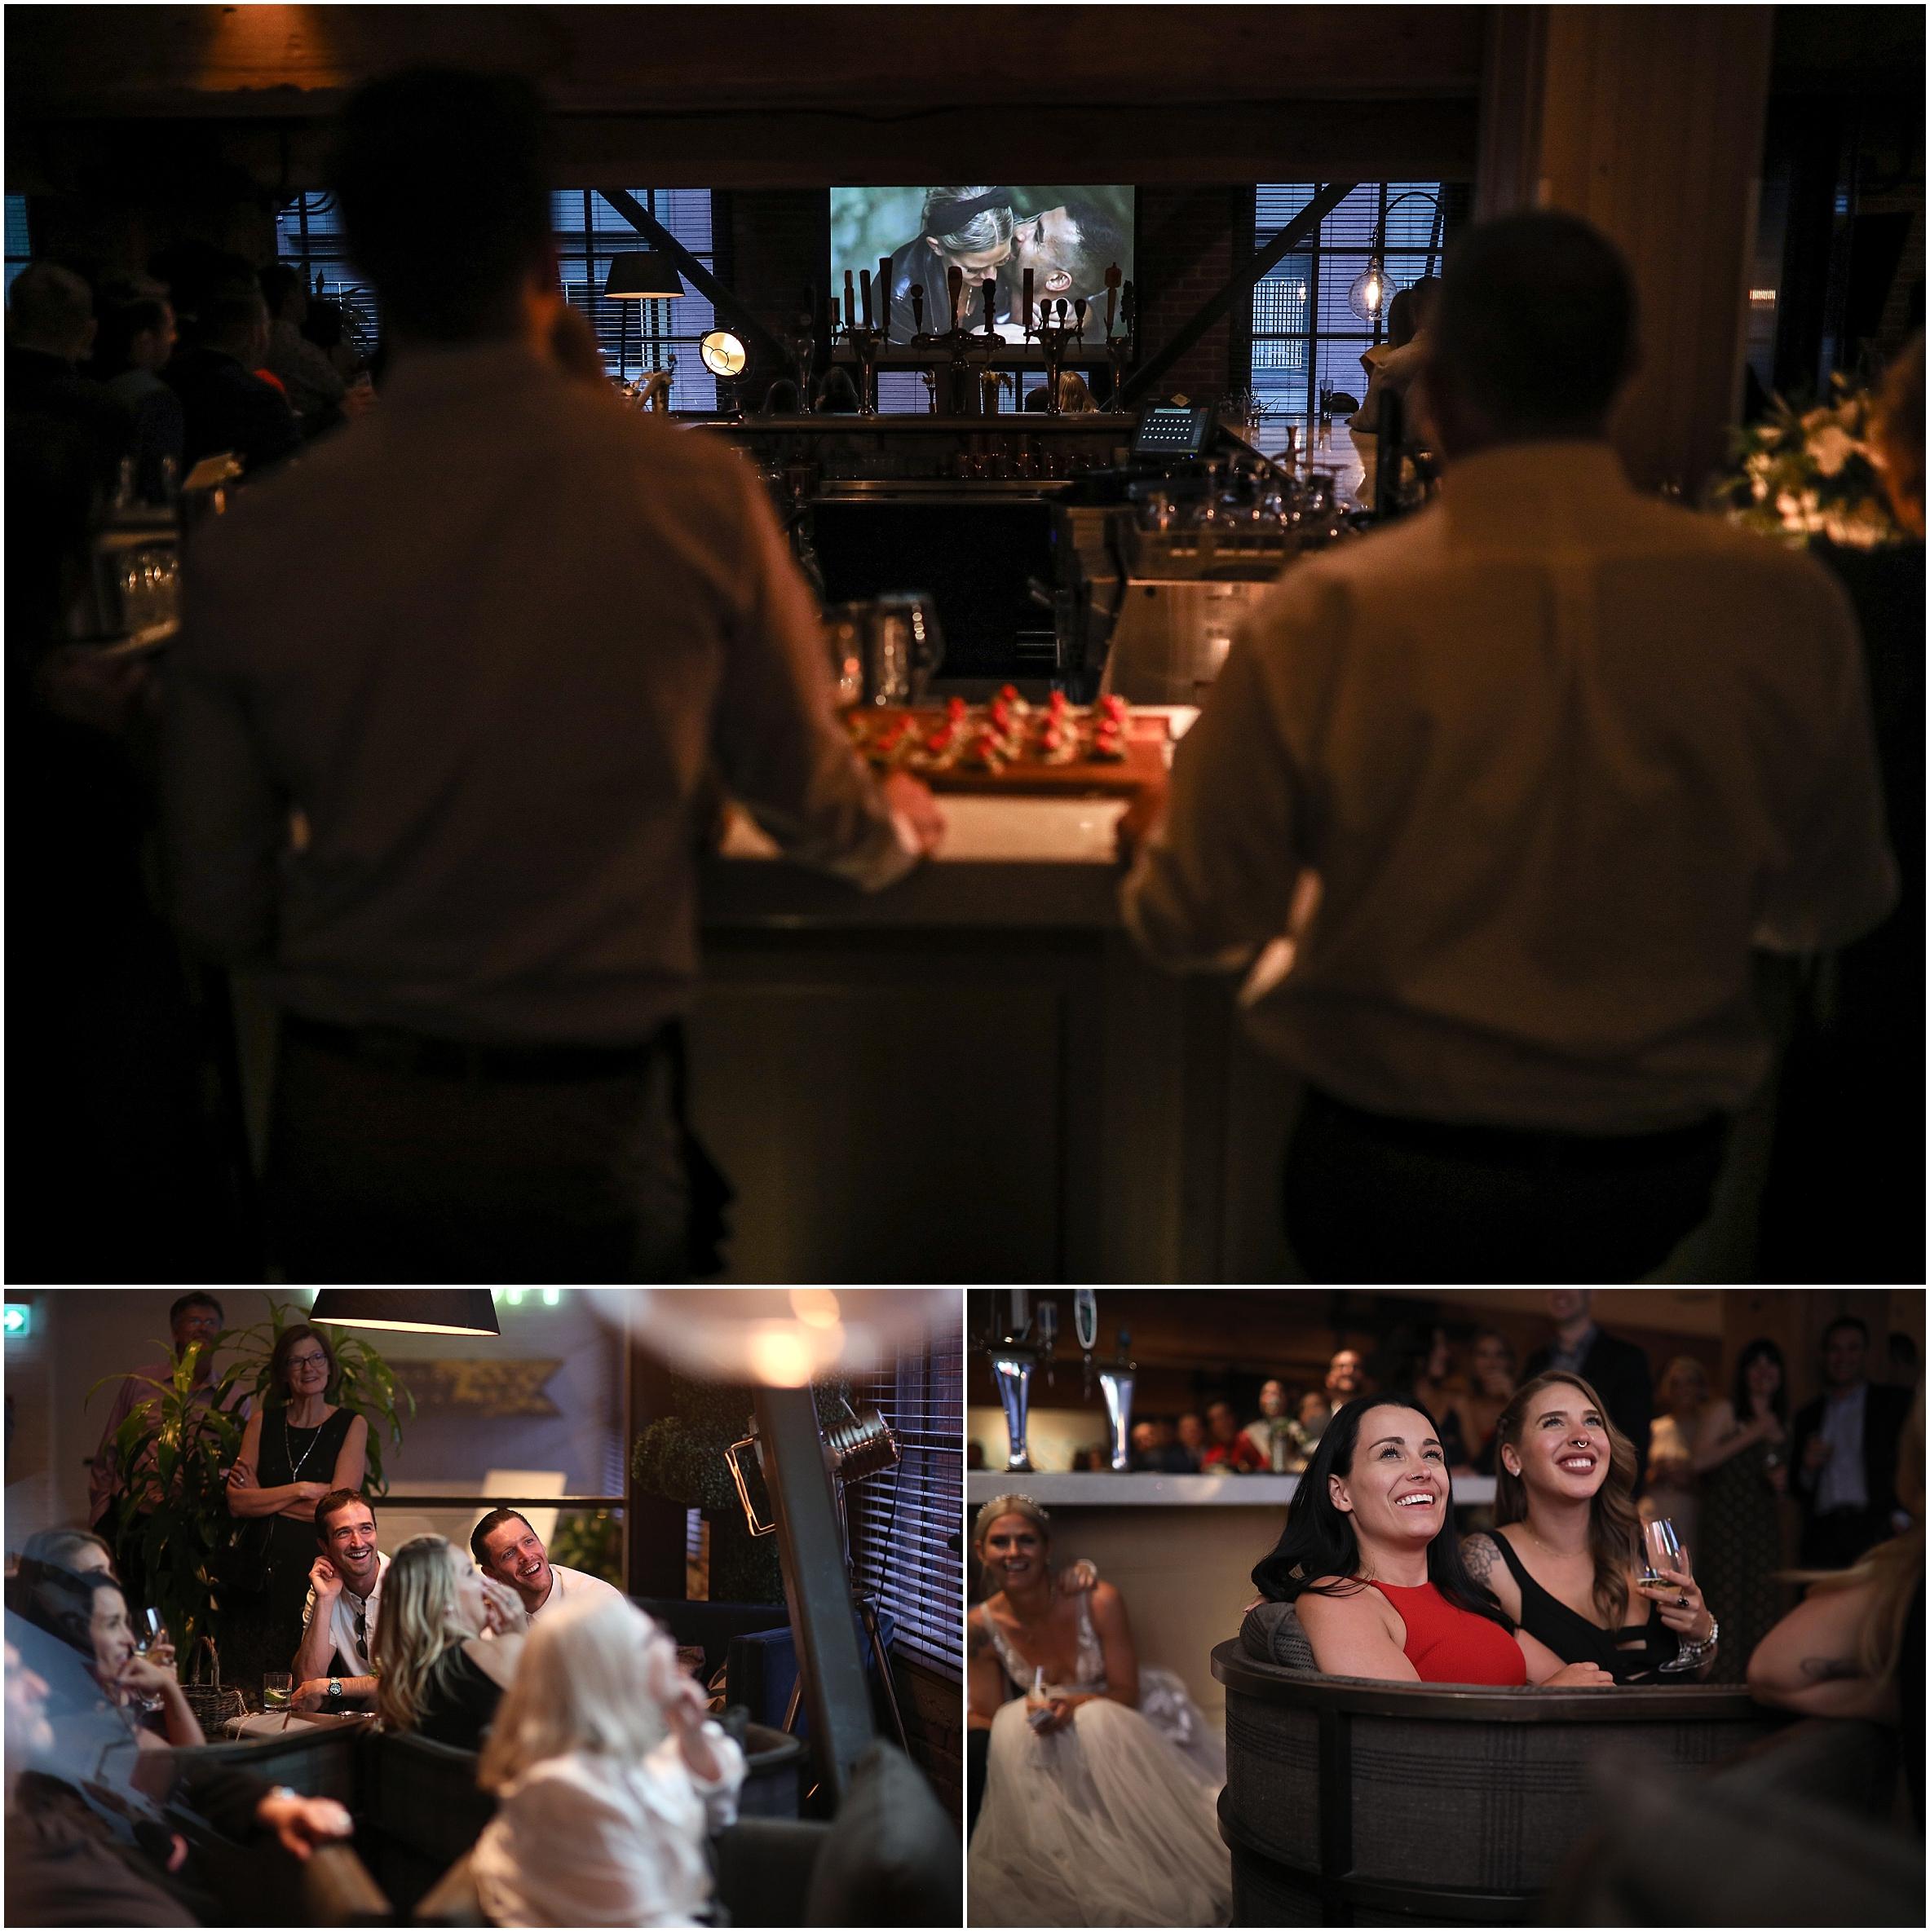 vancouver-wedding-photographer-the-loft-earls-yaletown_0030.jpg